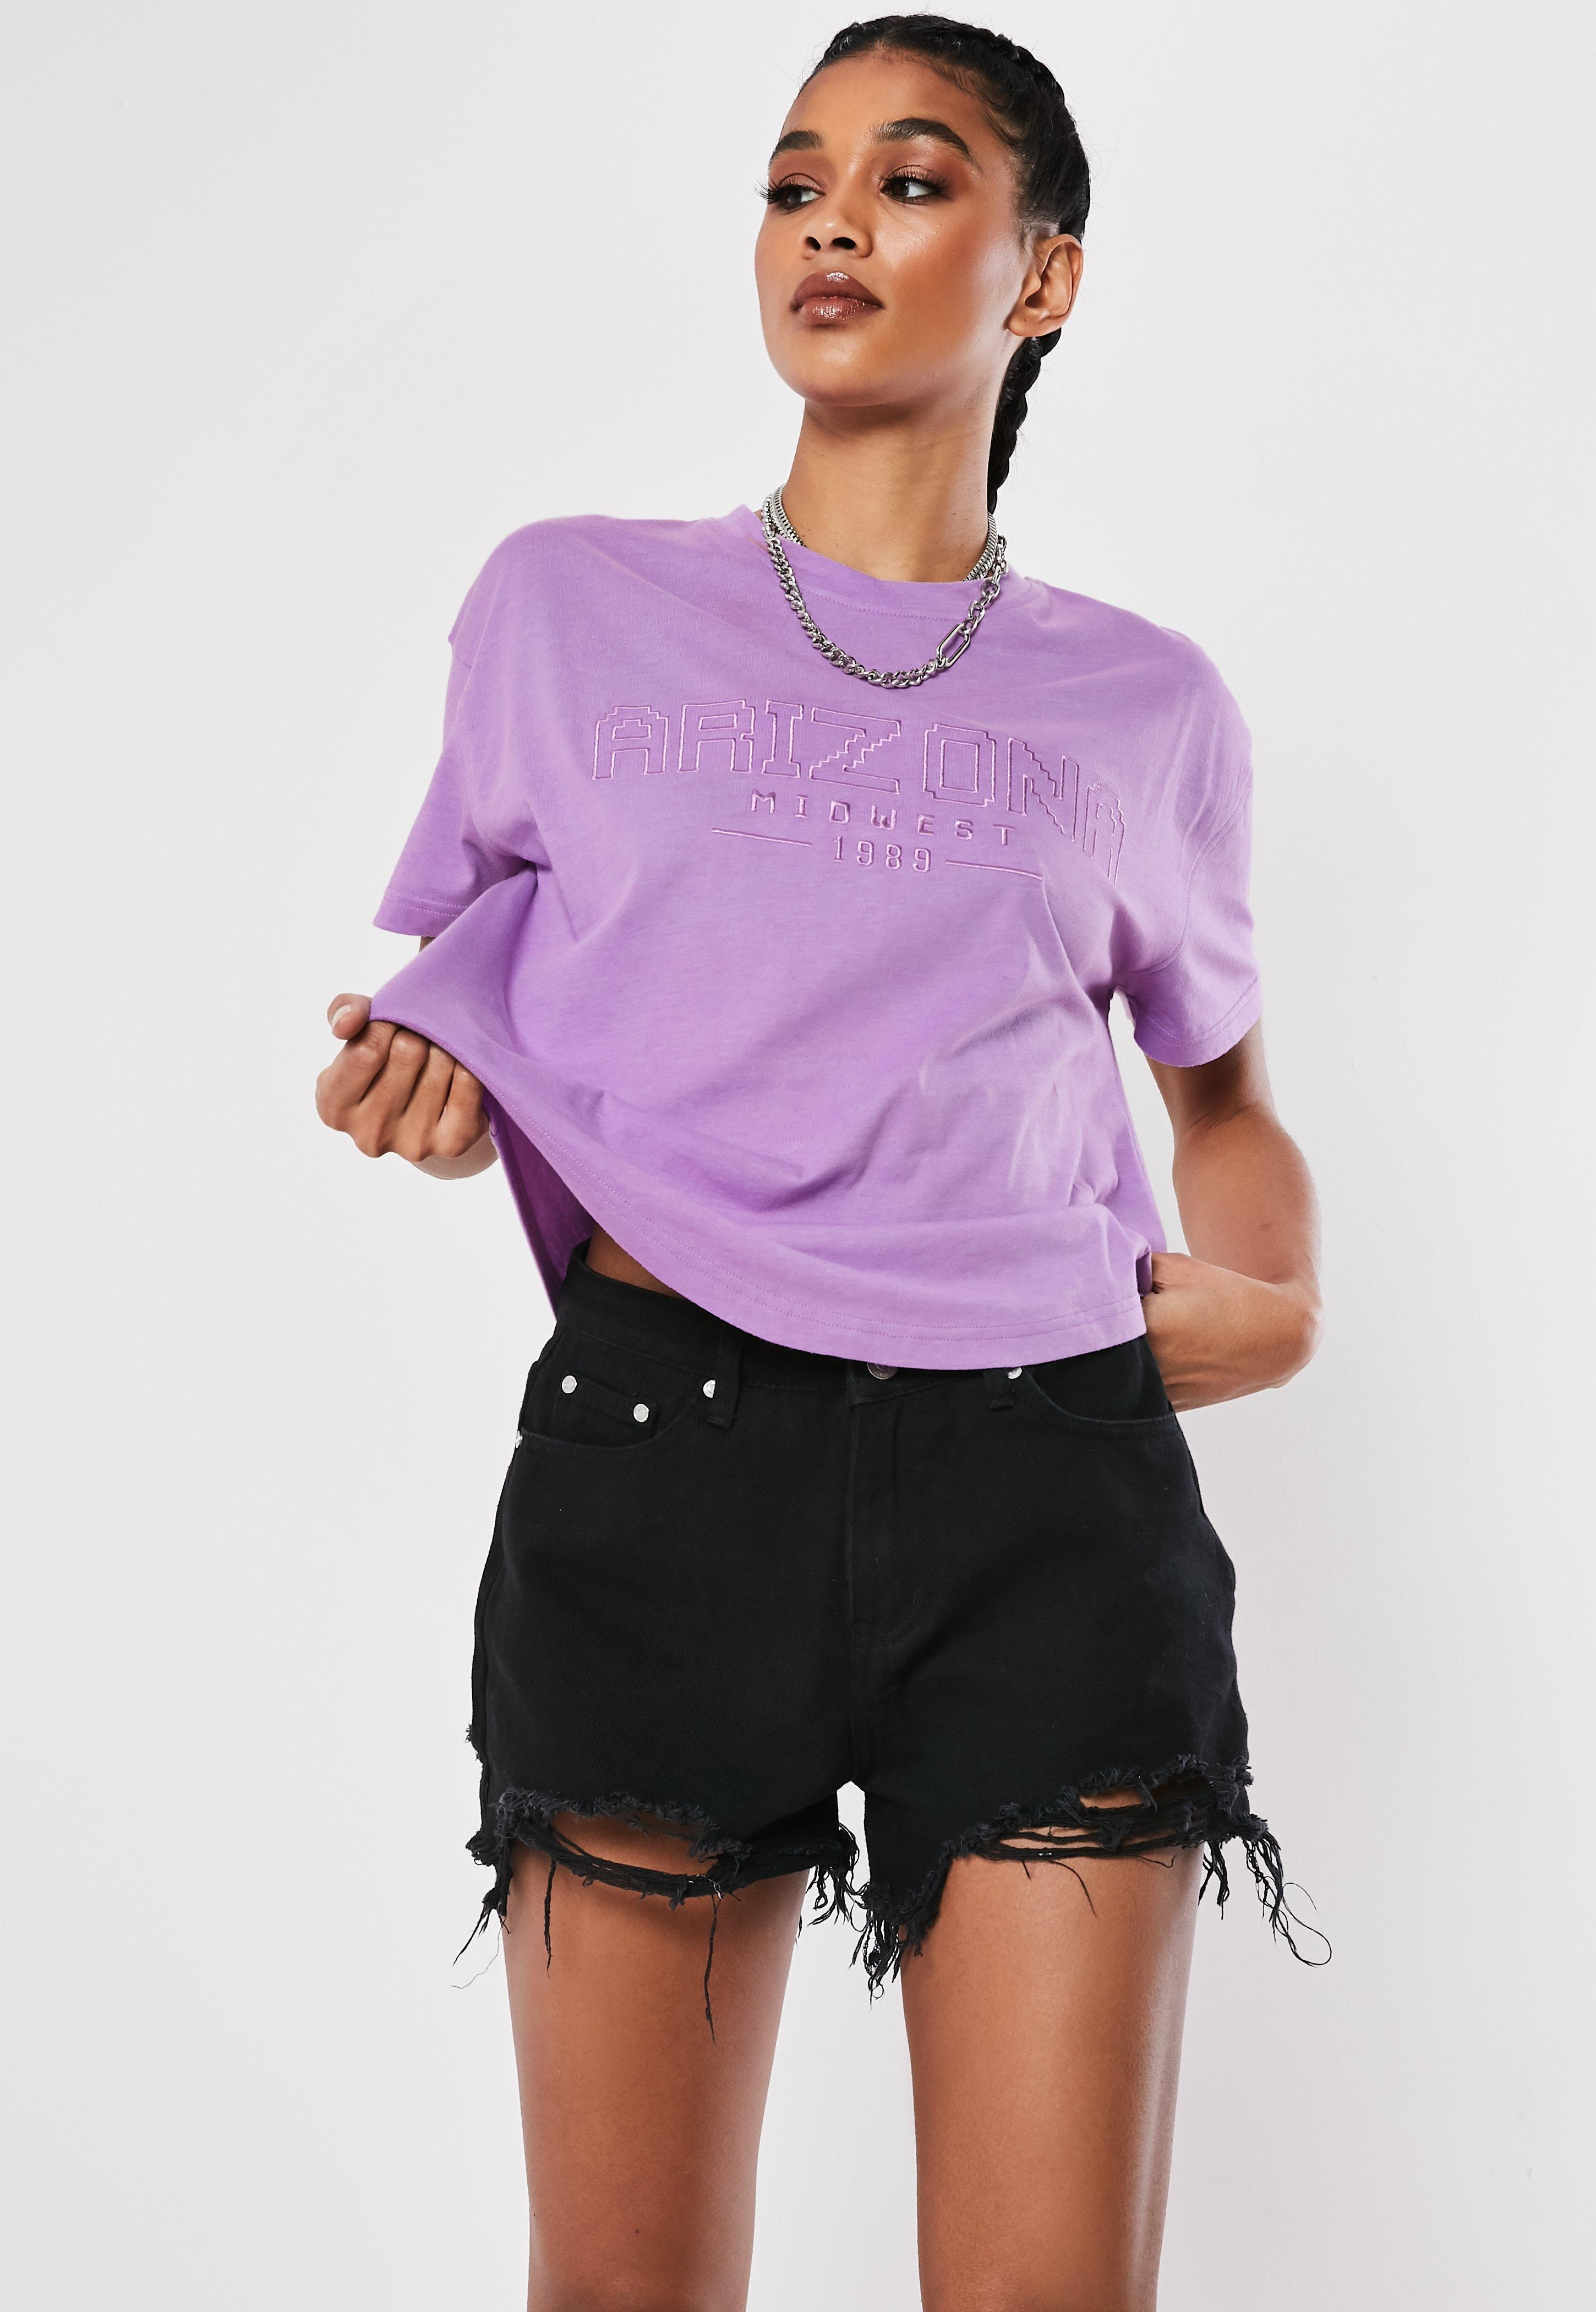 d795330210abc0 Women s T-Shirts - Graphic   Rock Tees Online